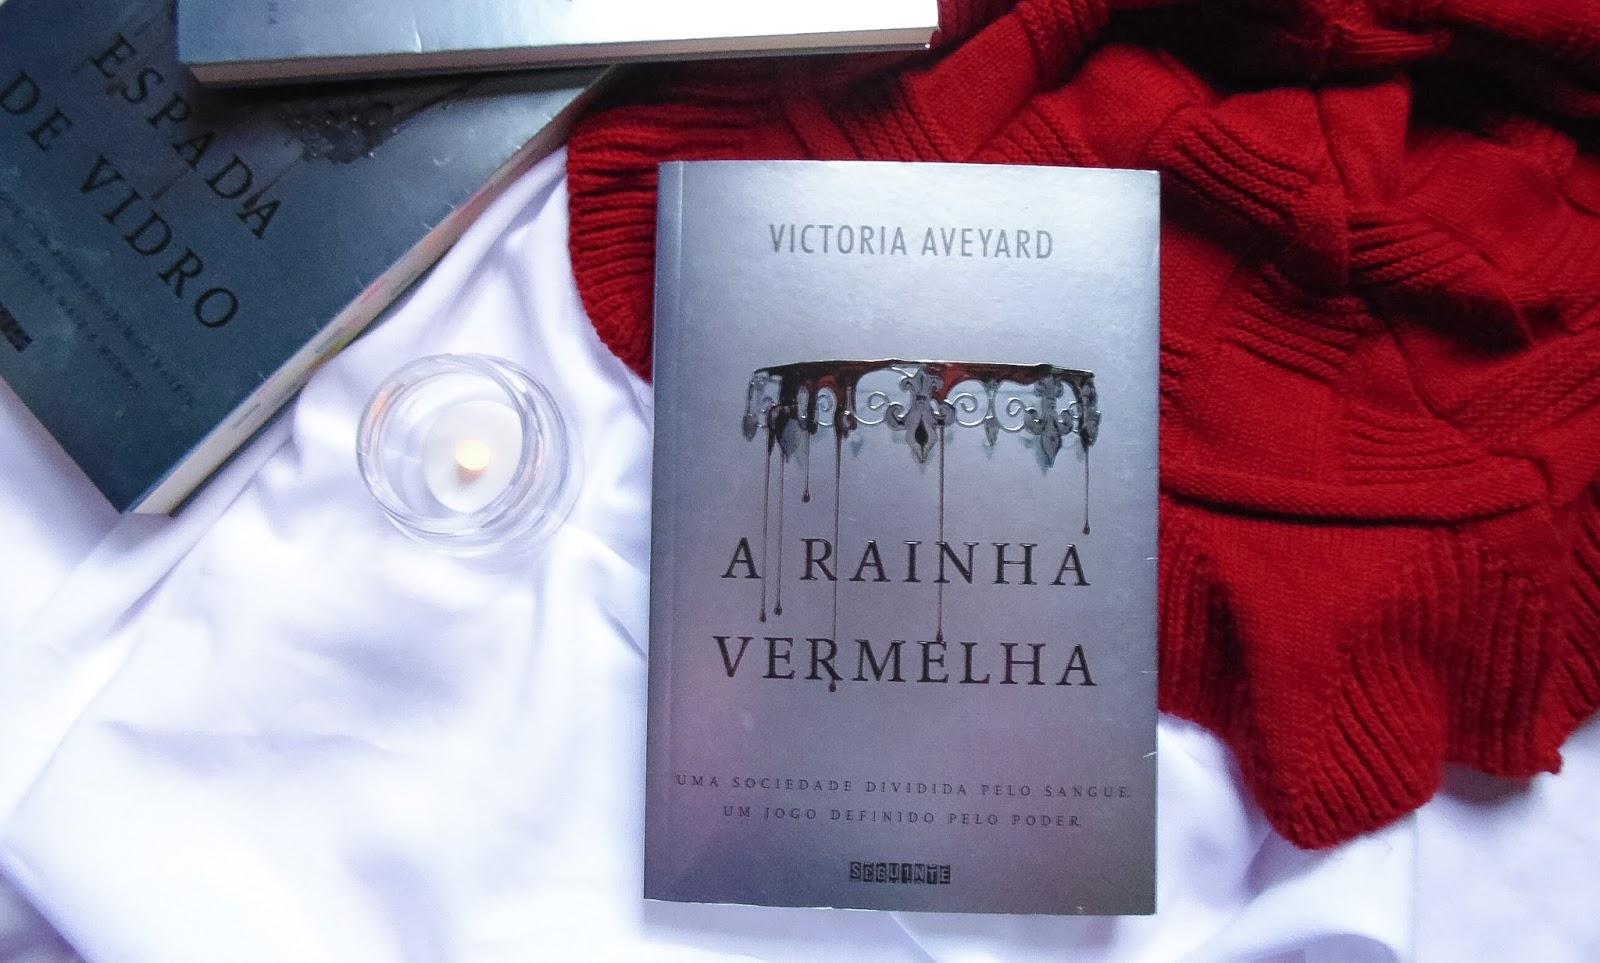 [RESENHA] A Rainha Vermelha – Victoria Aveyard